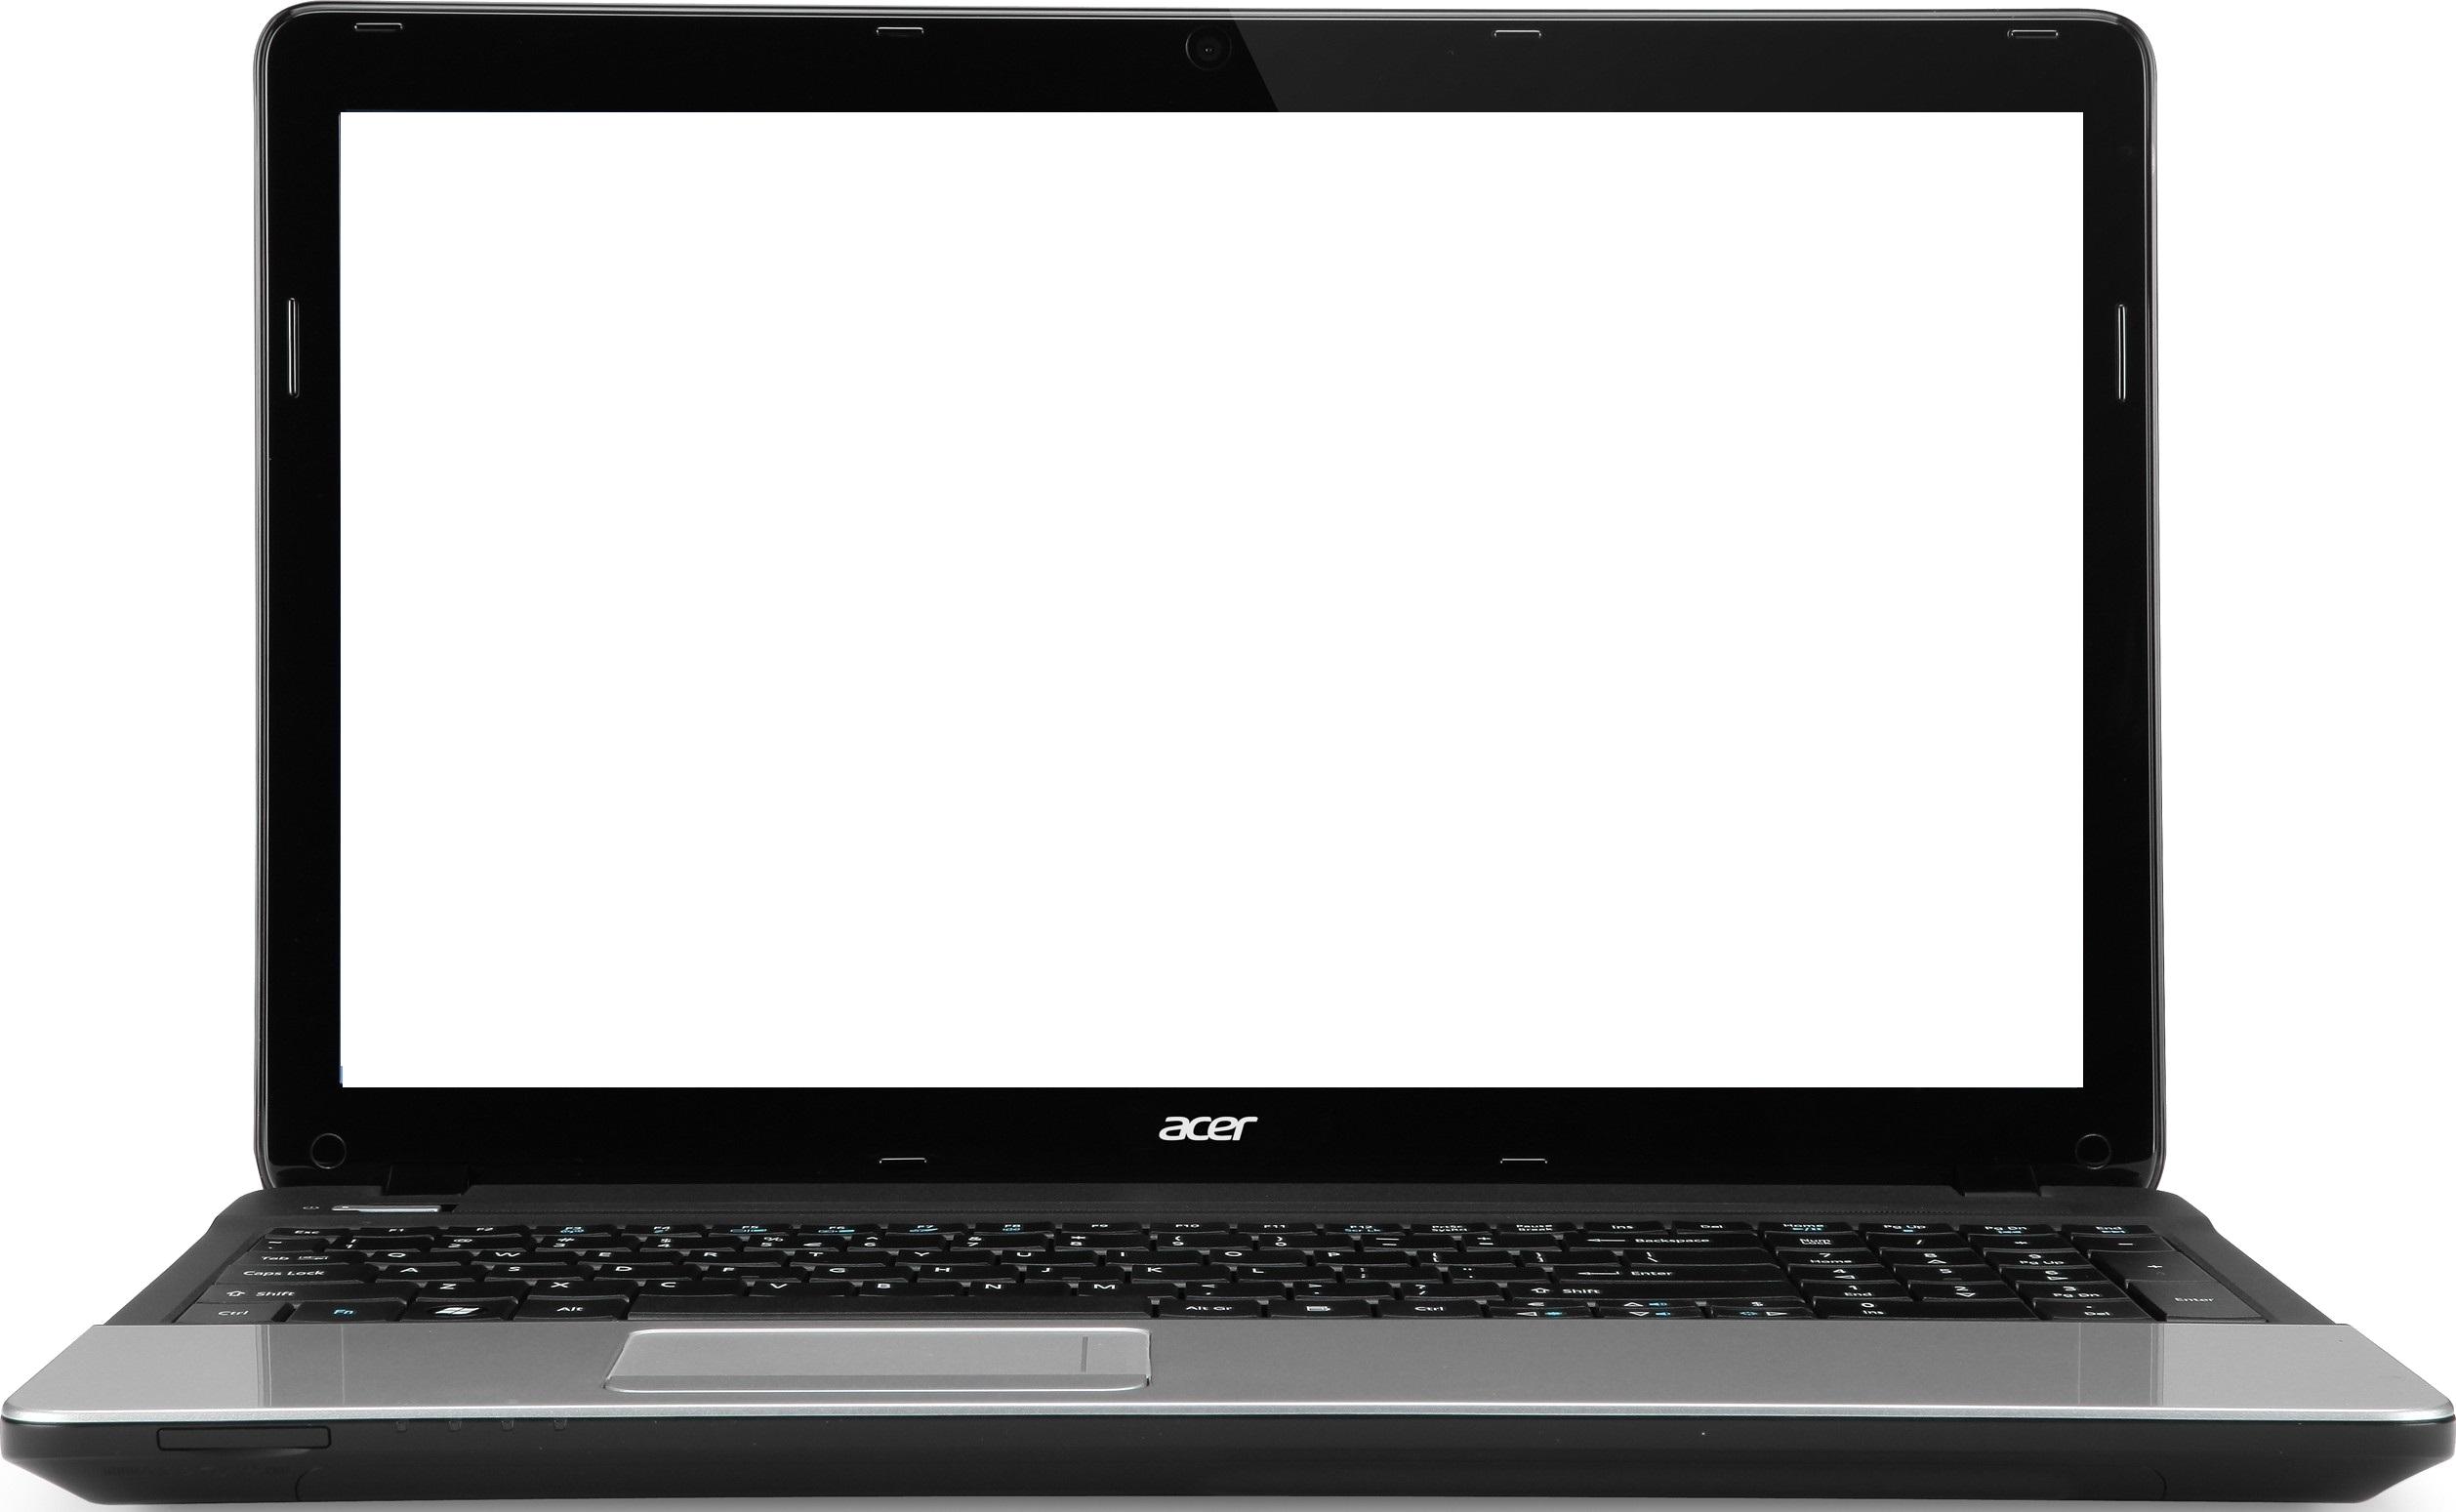 Laptop Notebook Png Image Laptop Laptop Screen Notebook Laptop